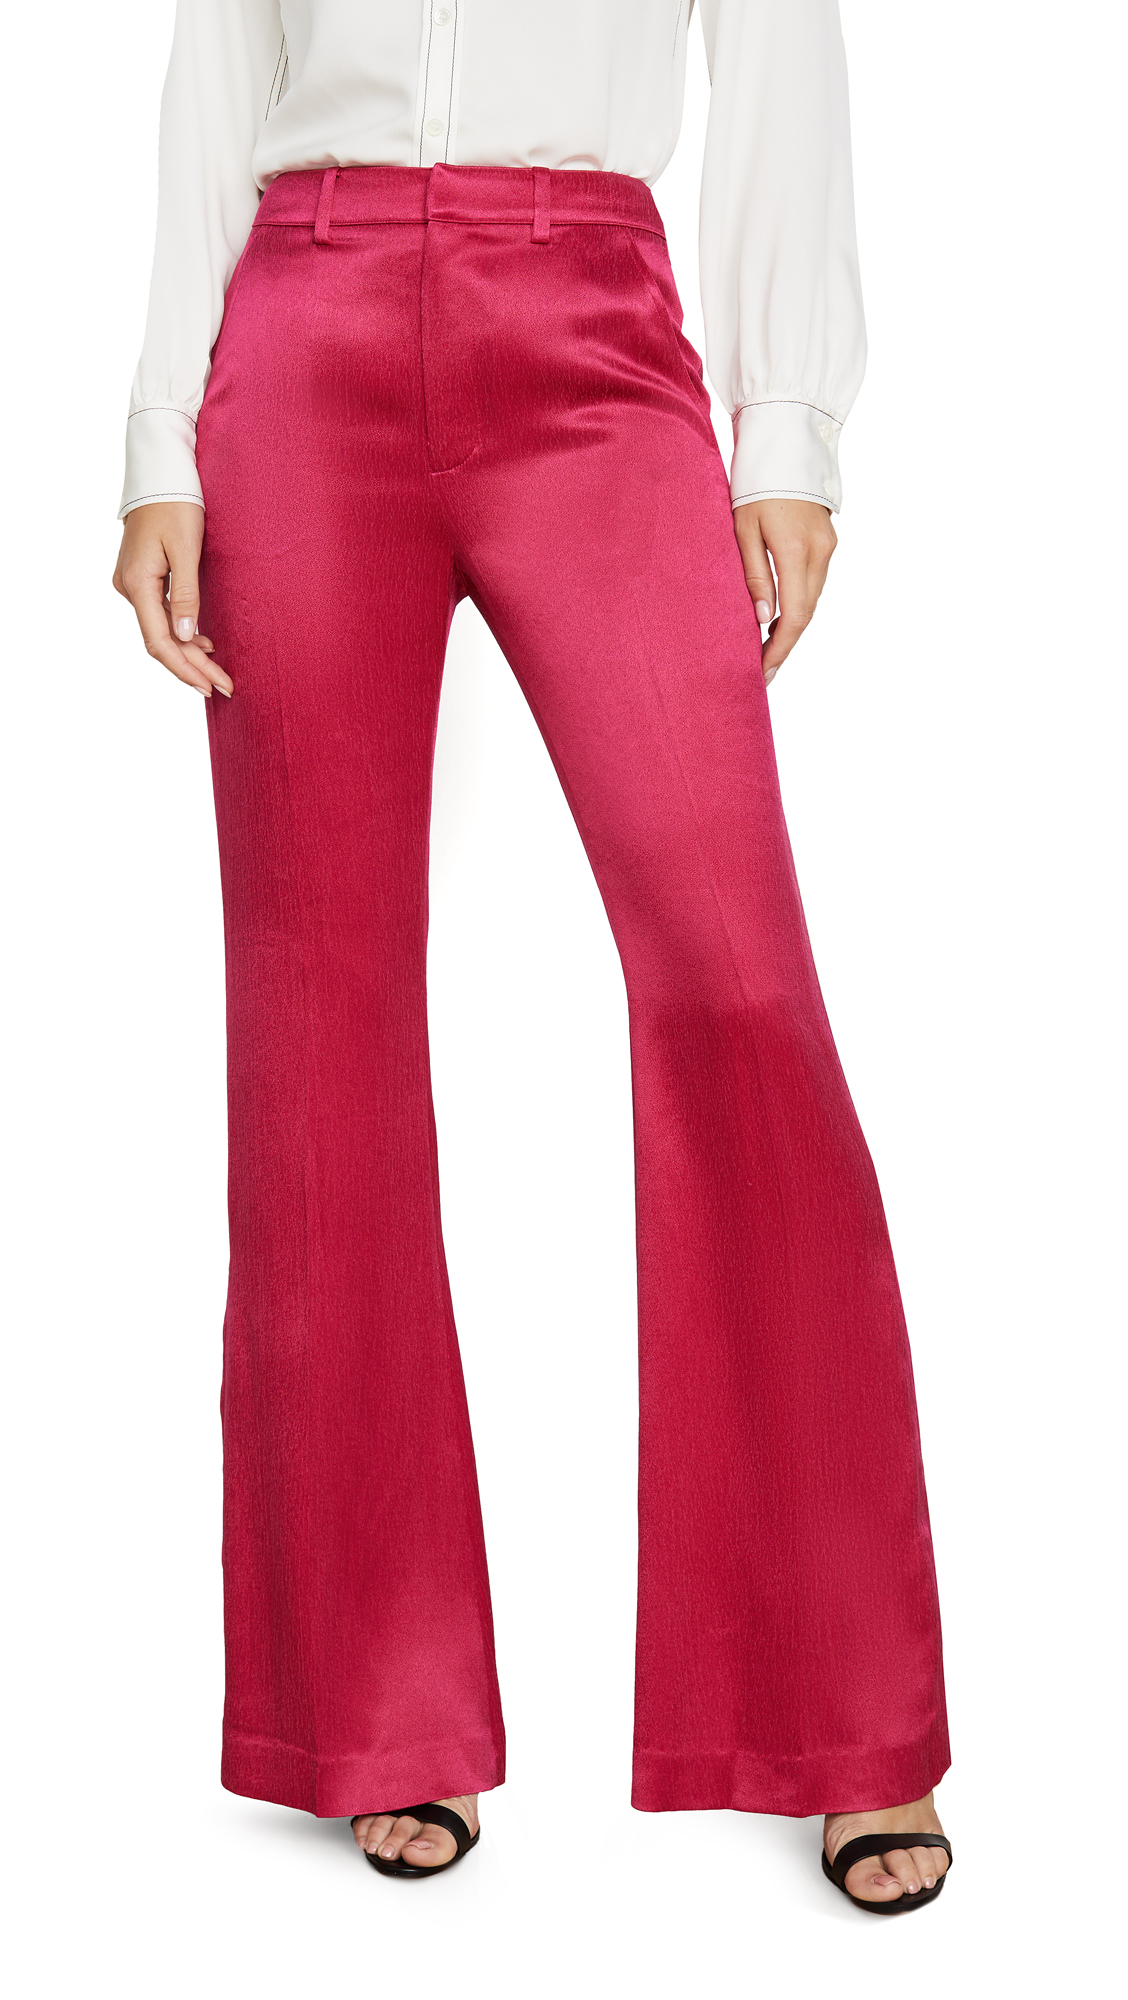 Adeam Bootleg Pants - Fuchsia